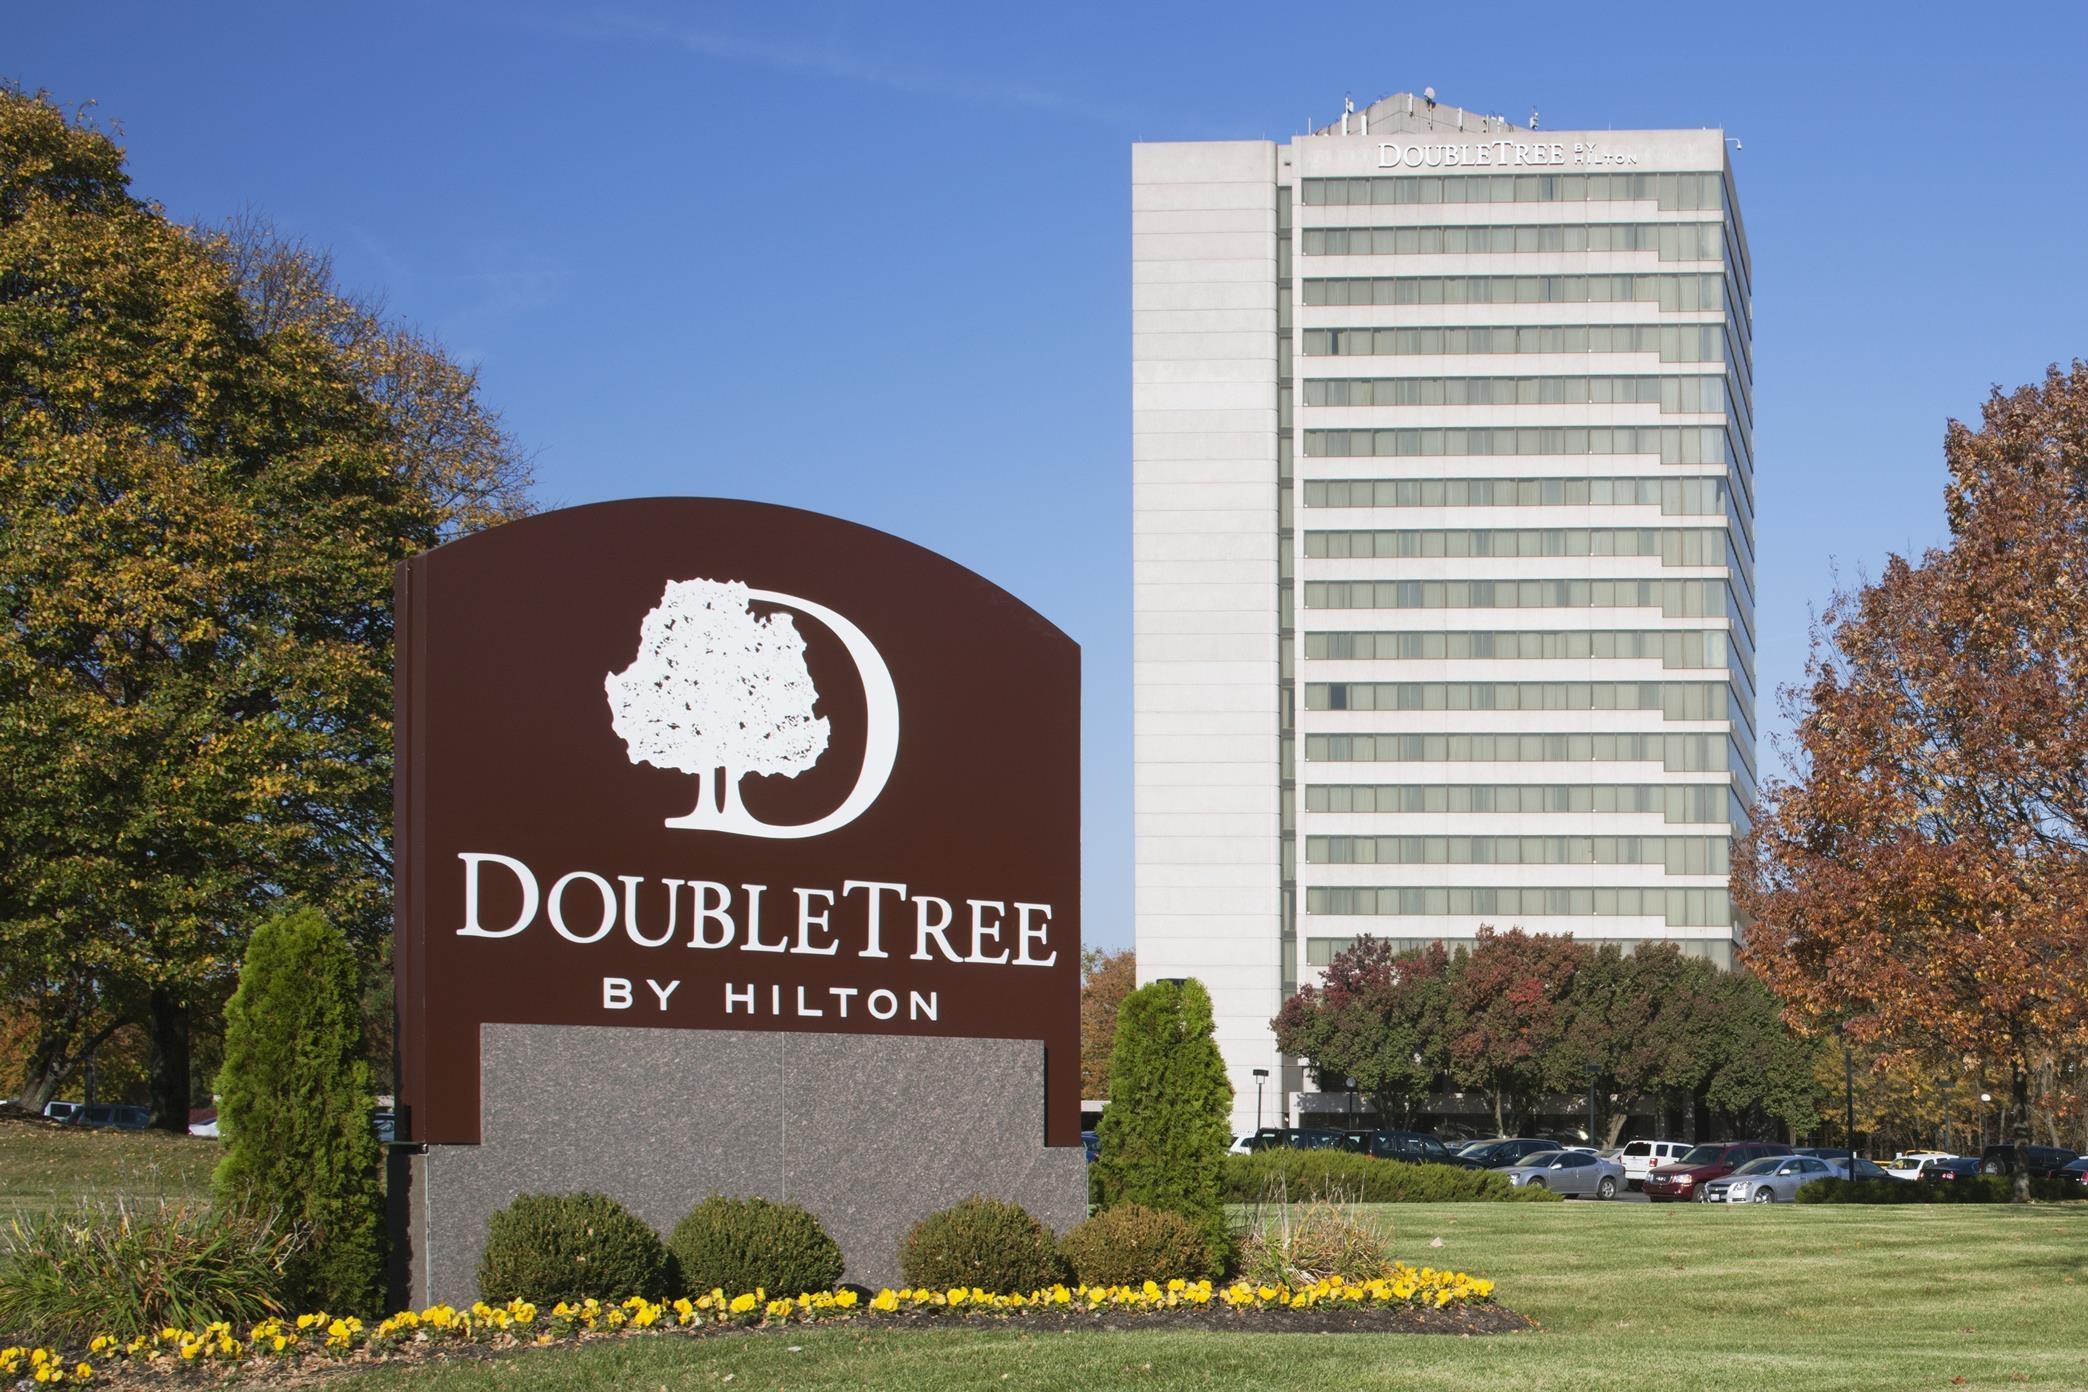 Doubletree By Hilton Hotel Kansas City Overland Park 10100 College Boulevard Overland Park